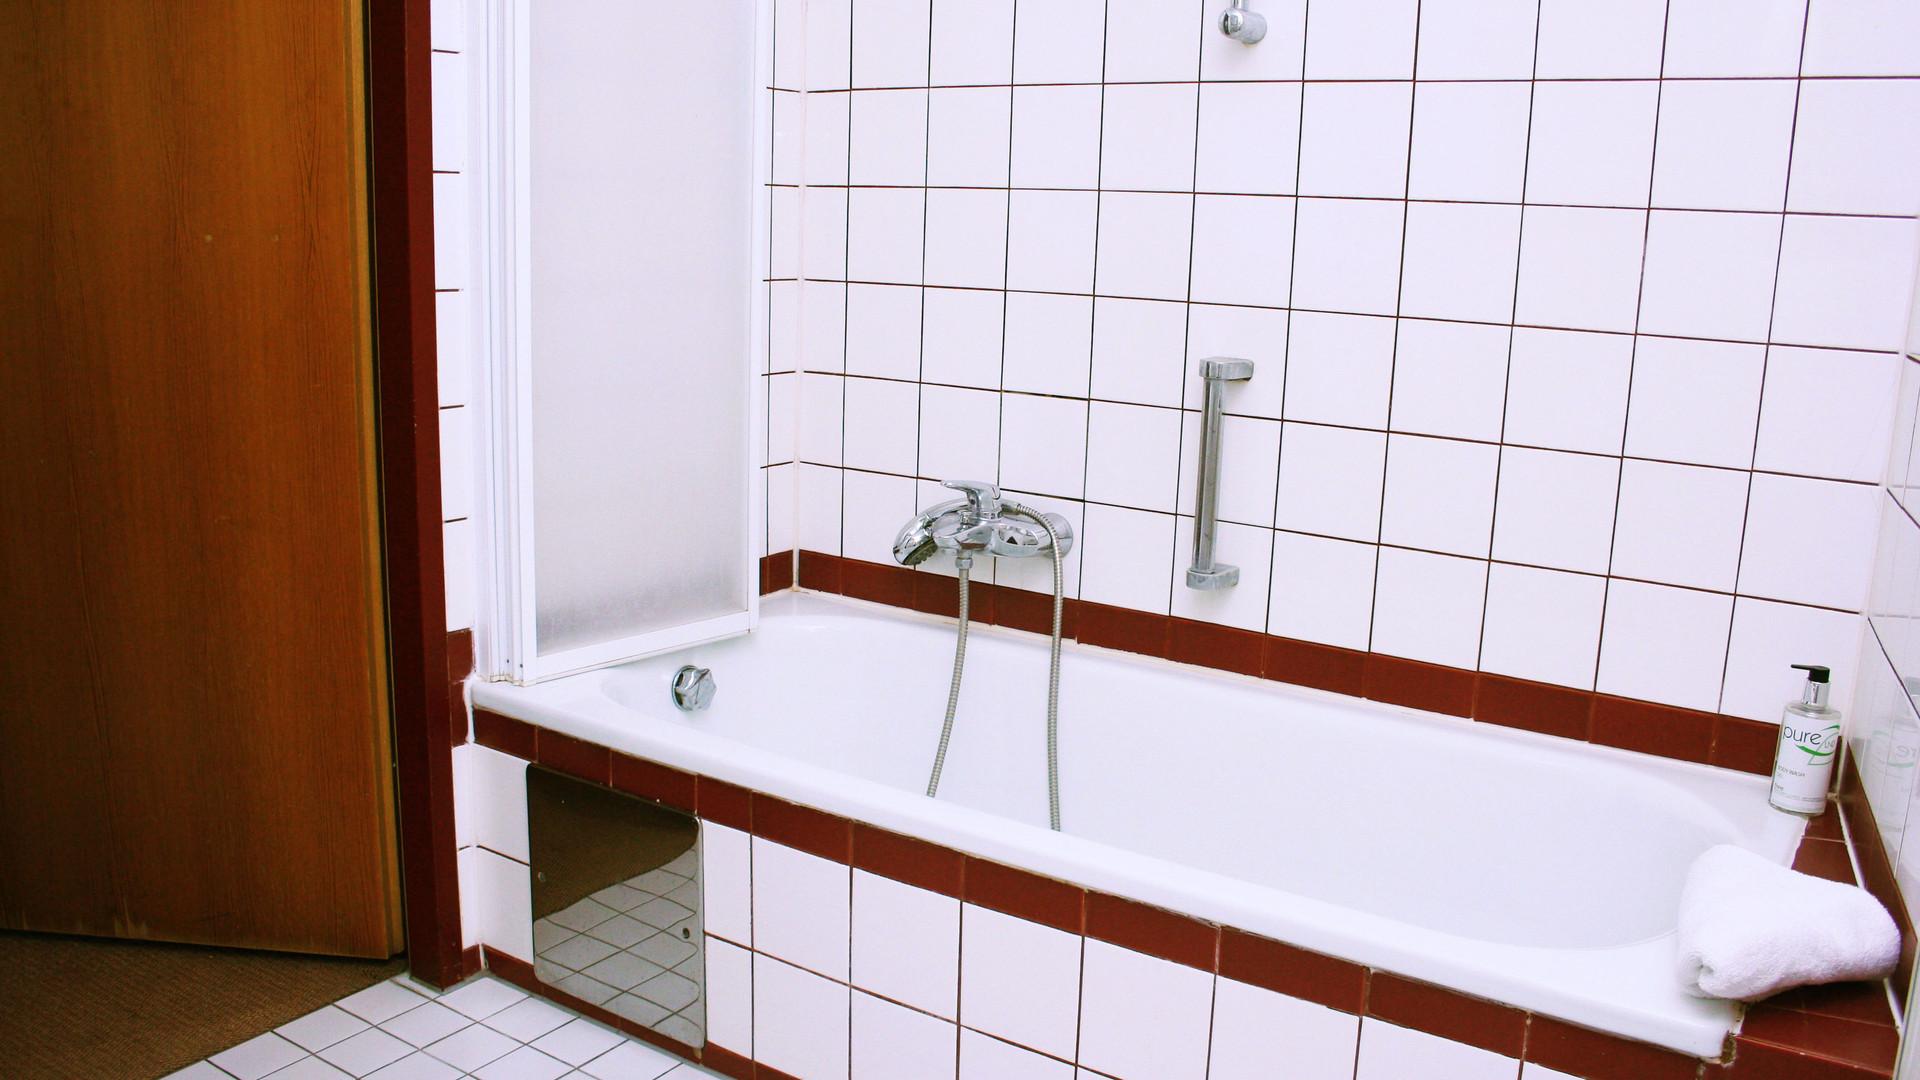 Badezimmer im Hotel Garni